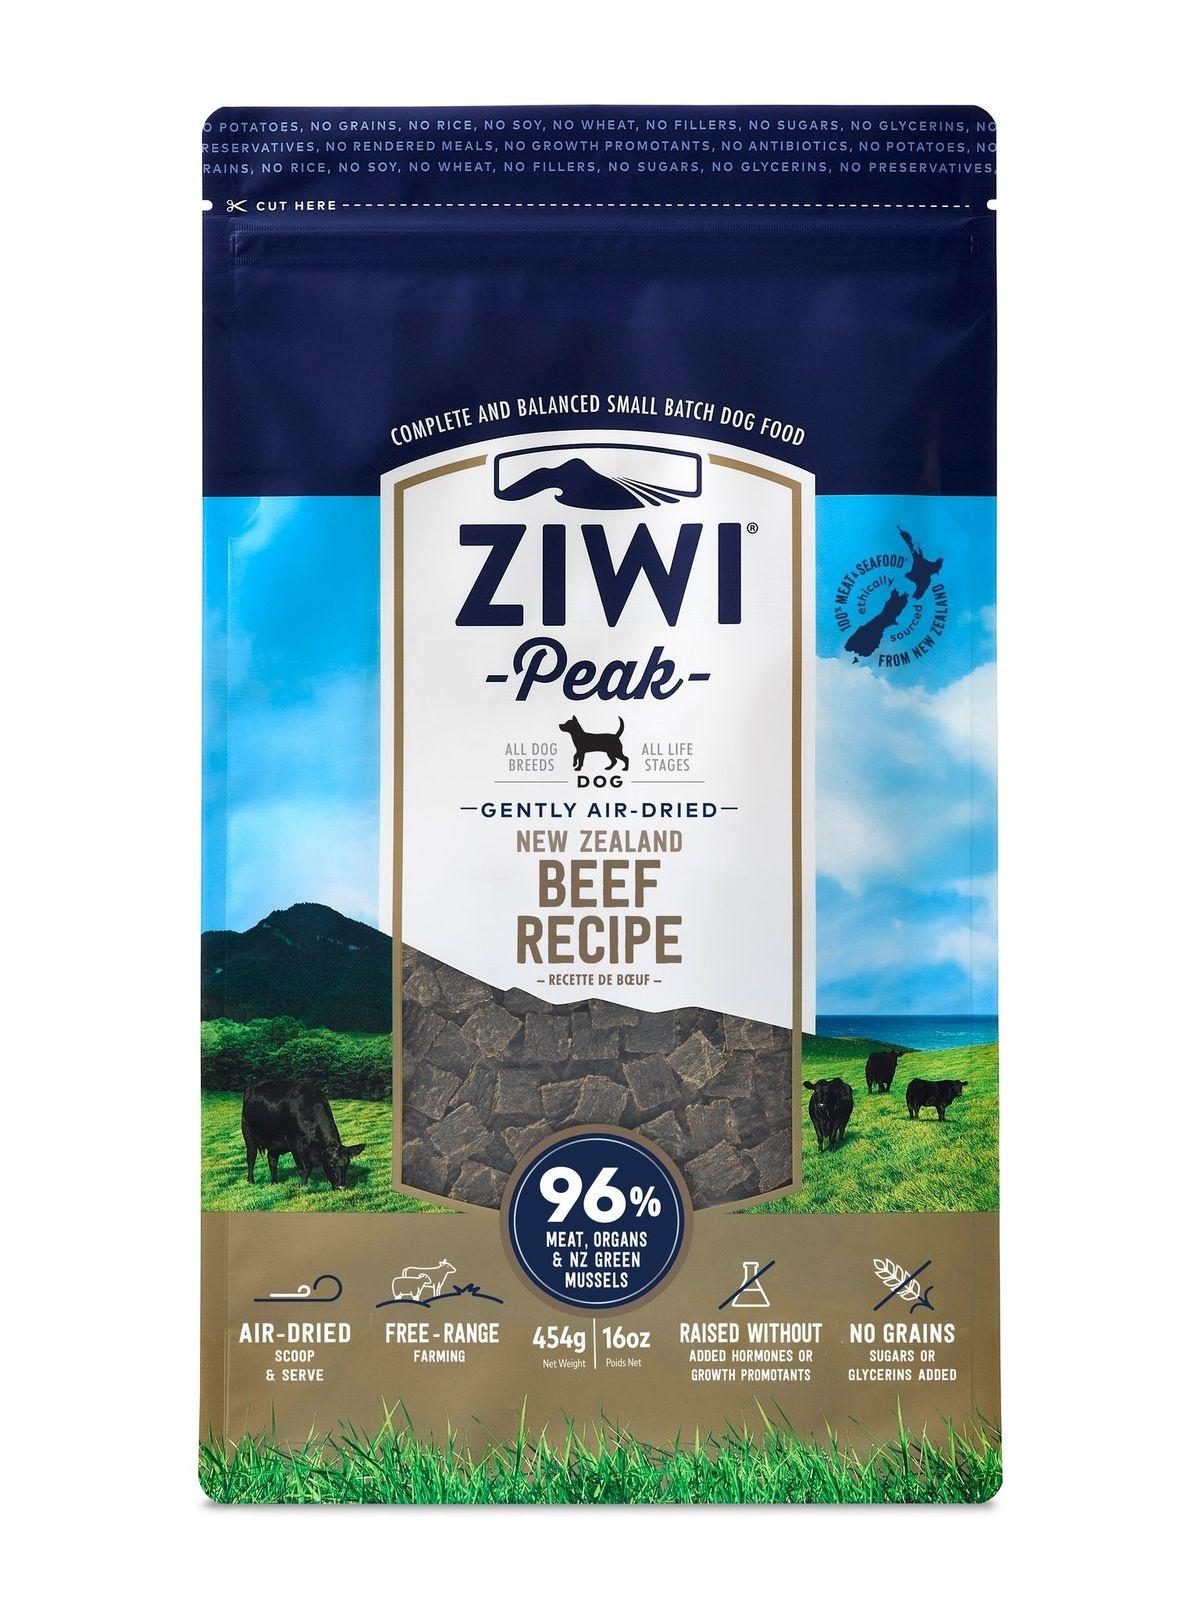 Ziwi Peak Ziwi Peak Beef Air Dried Dog Food